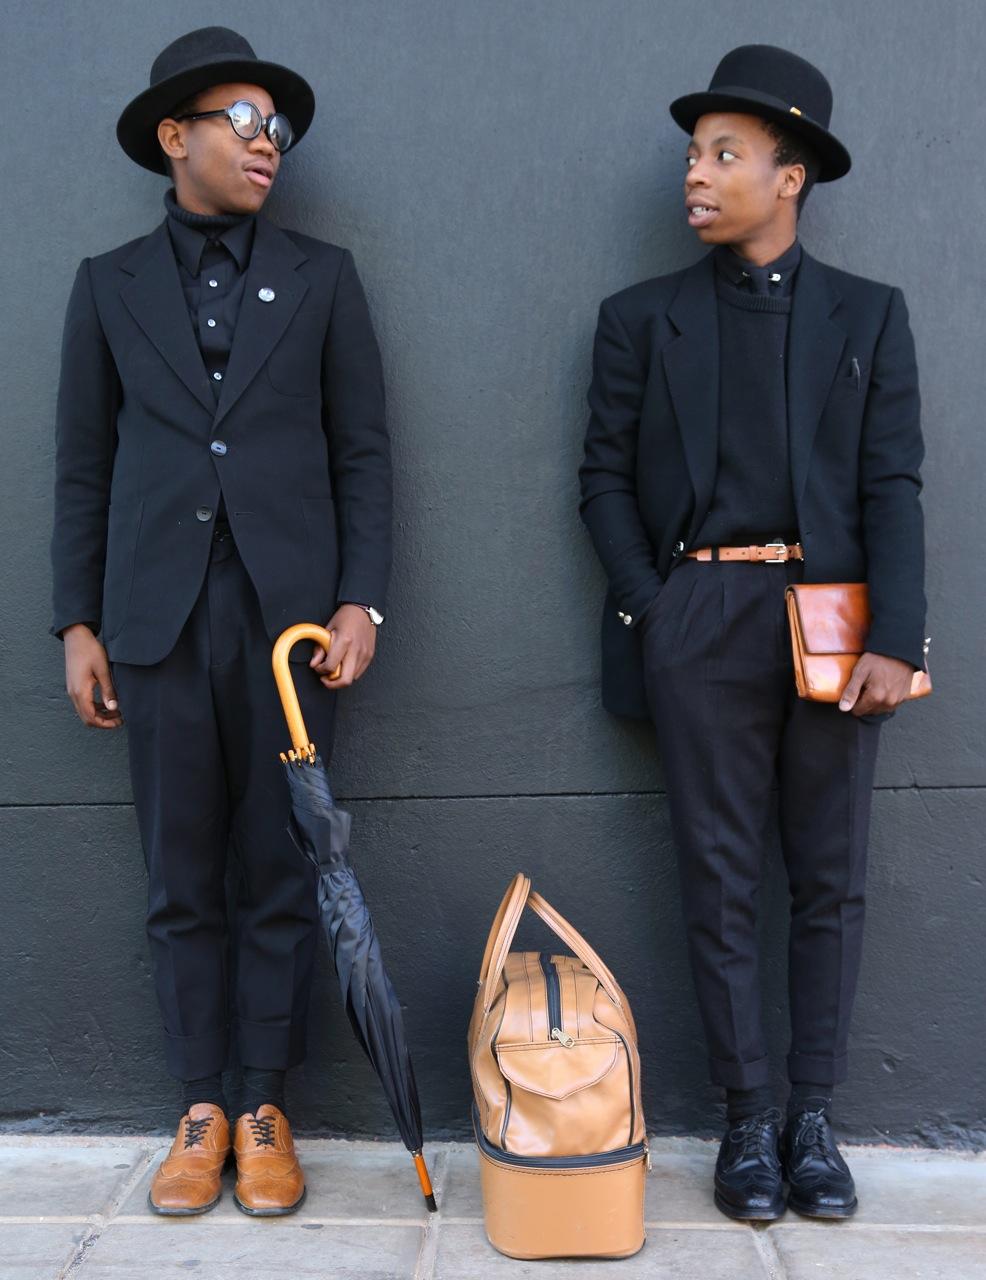 La fashion clothing store 78